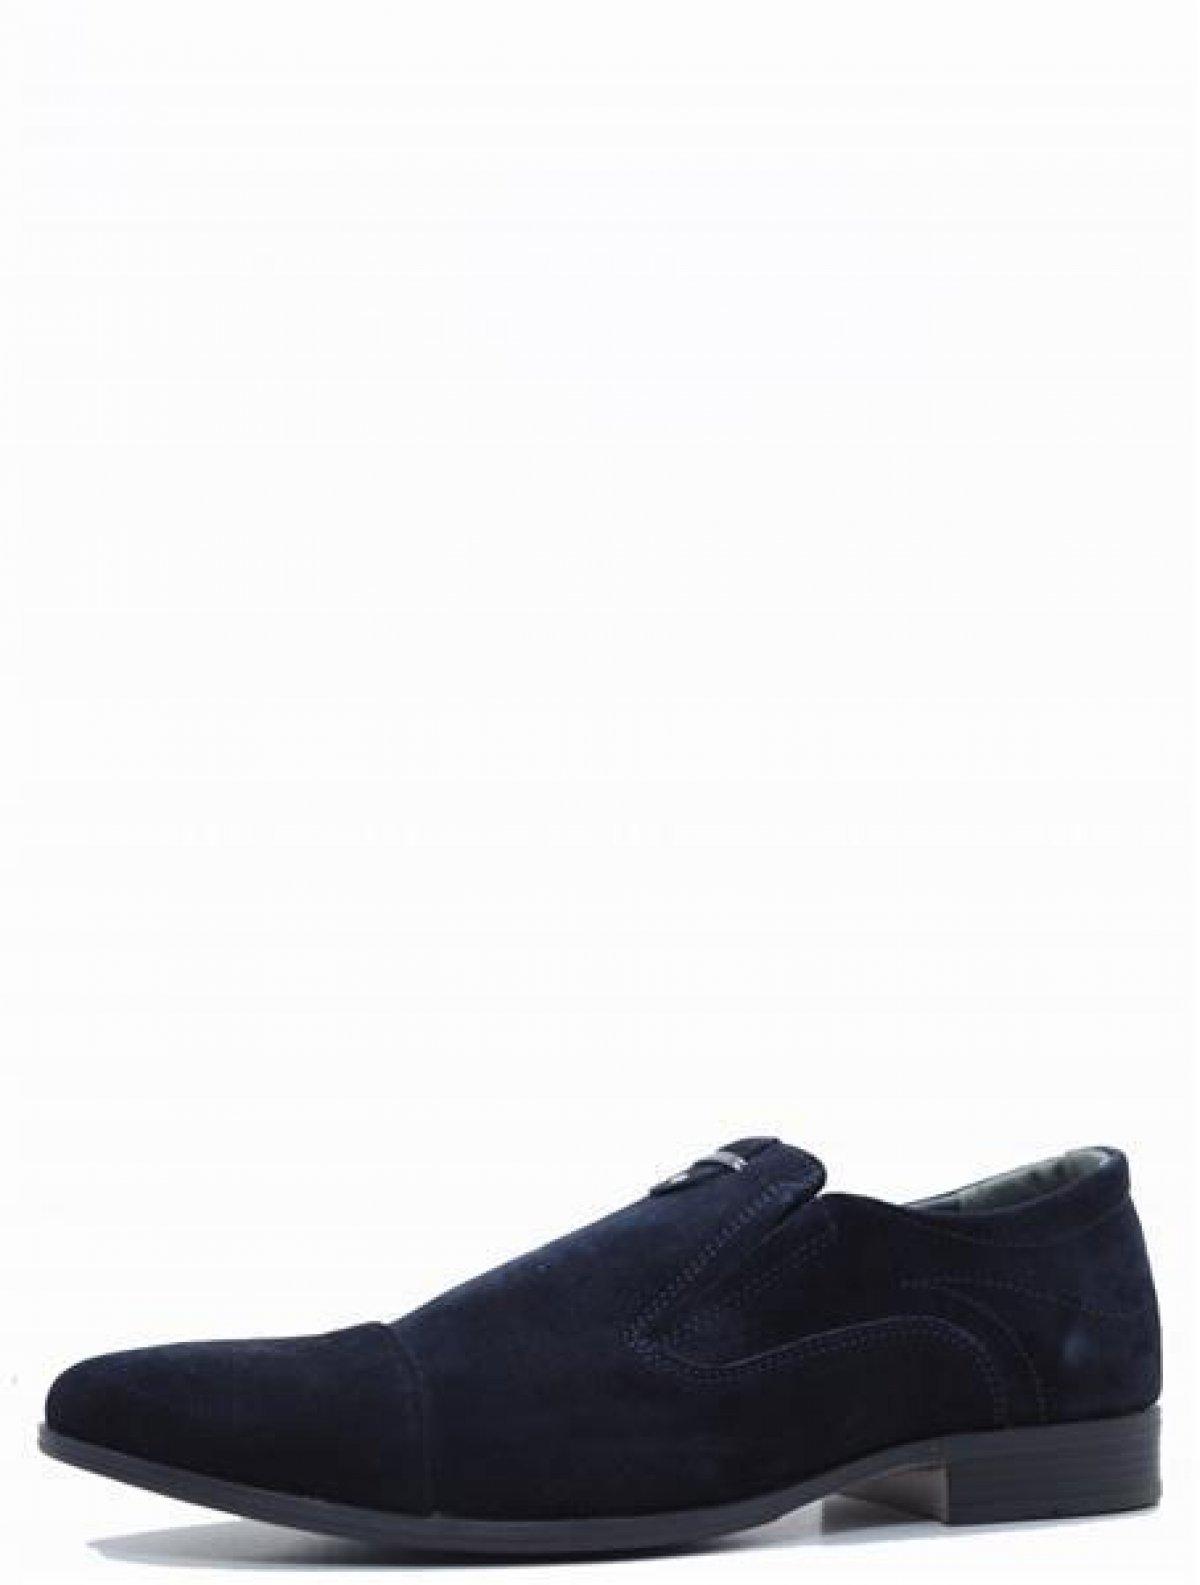 Fossa 800-10-03 мужские туфли